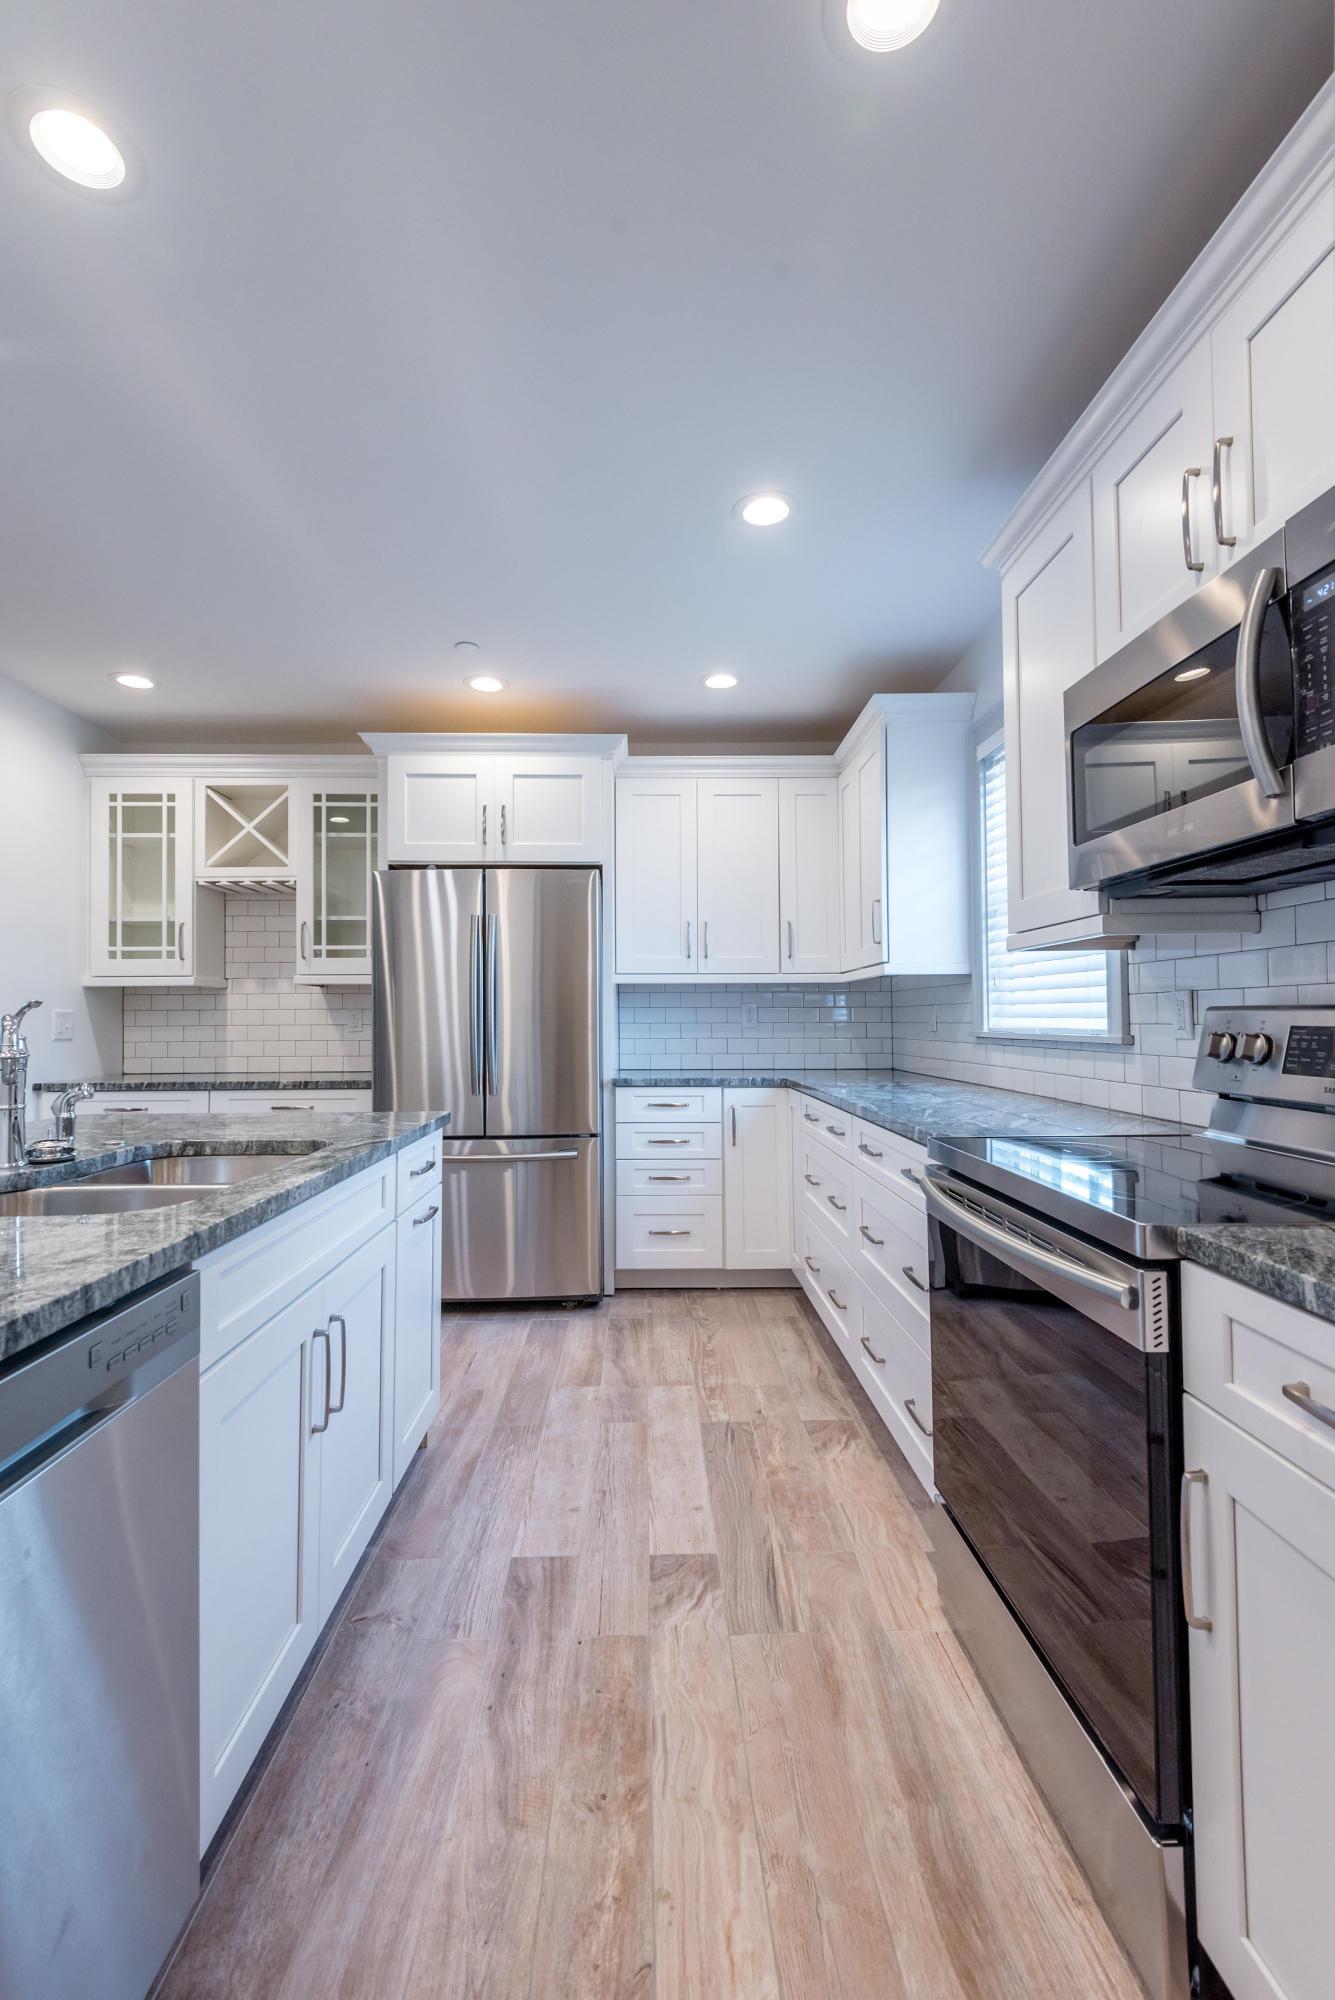 Homes For Sale - 321 Ashley, Charleston, SC - 5